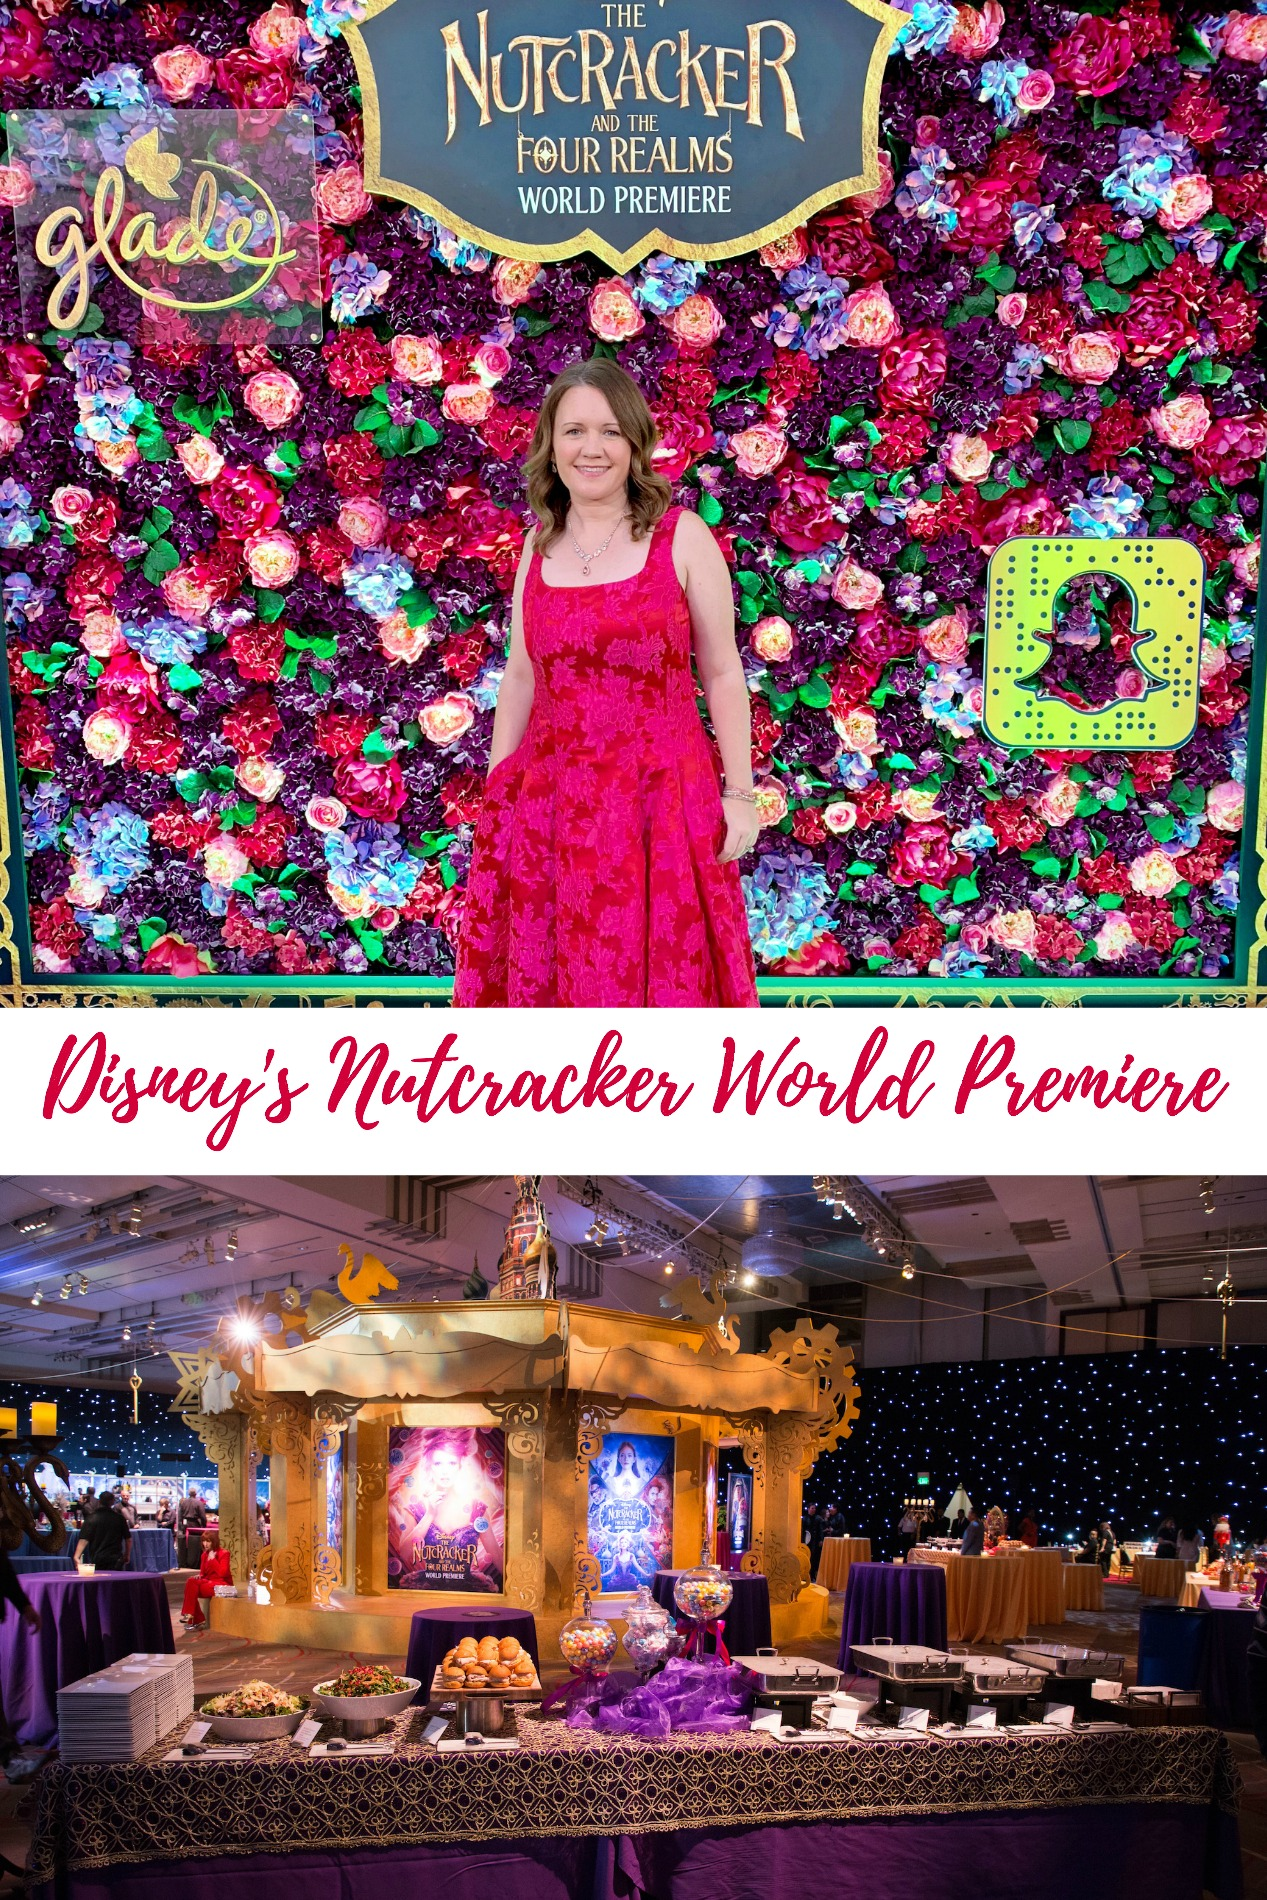 Disney's Nutcracker World Premiere